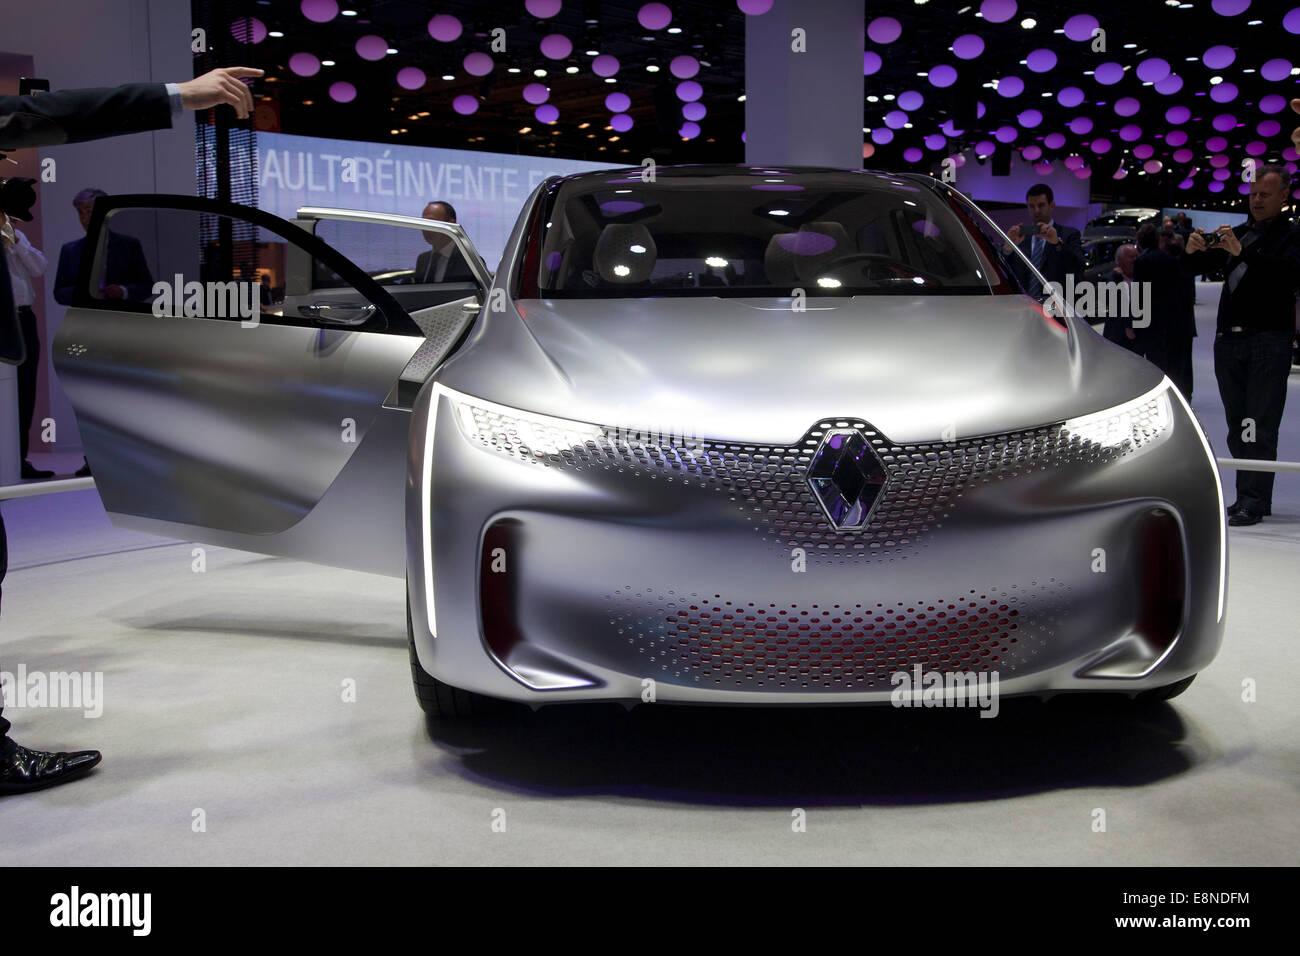 El Renault de Eolab coche eléctrico plug-in Paris Motor Show Mondial de l'automobile 2014 Imagen De Stock